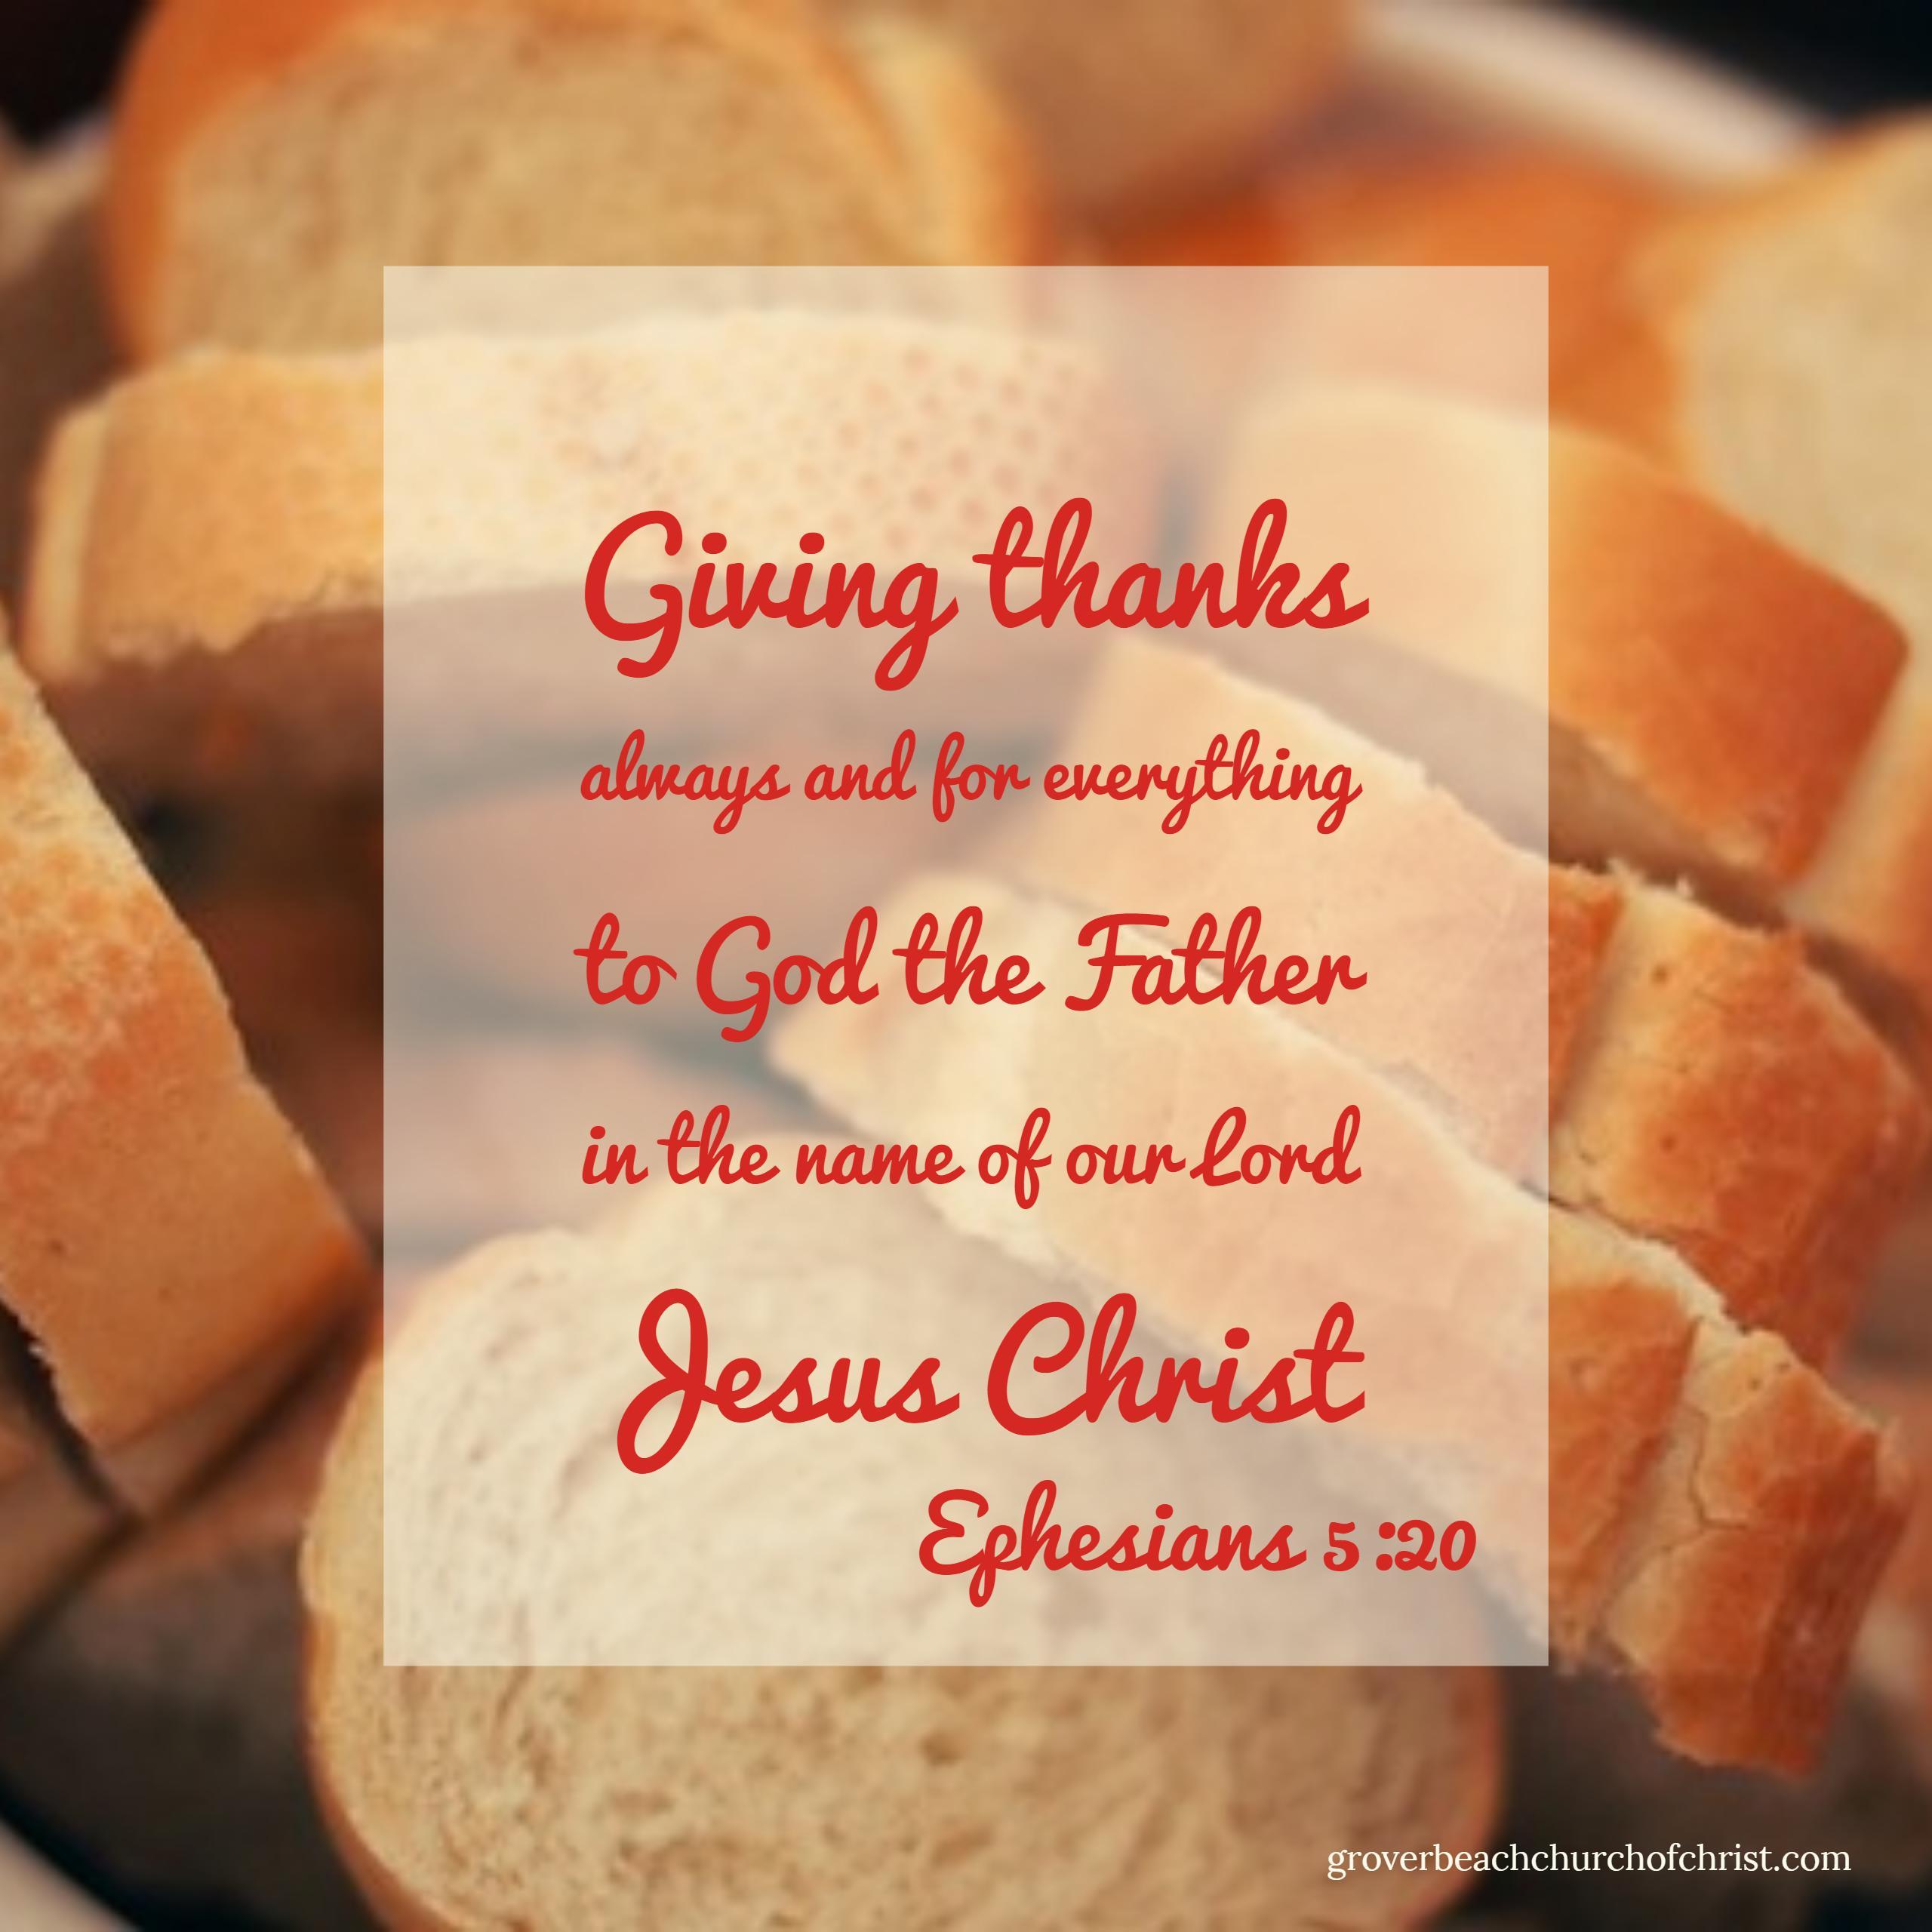 ephesians-5-20-giving-thanks-always